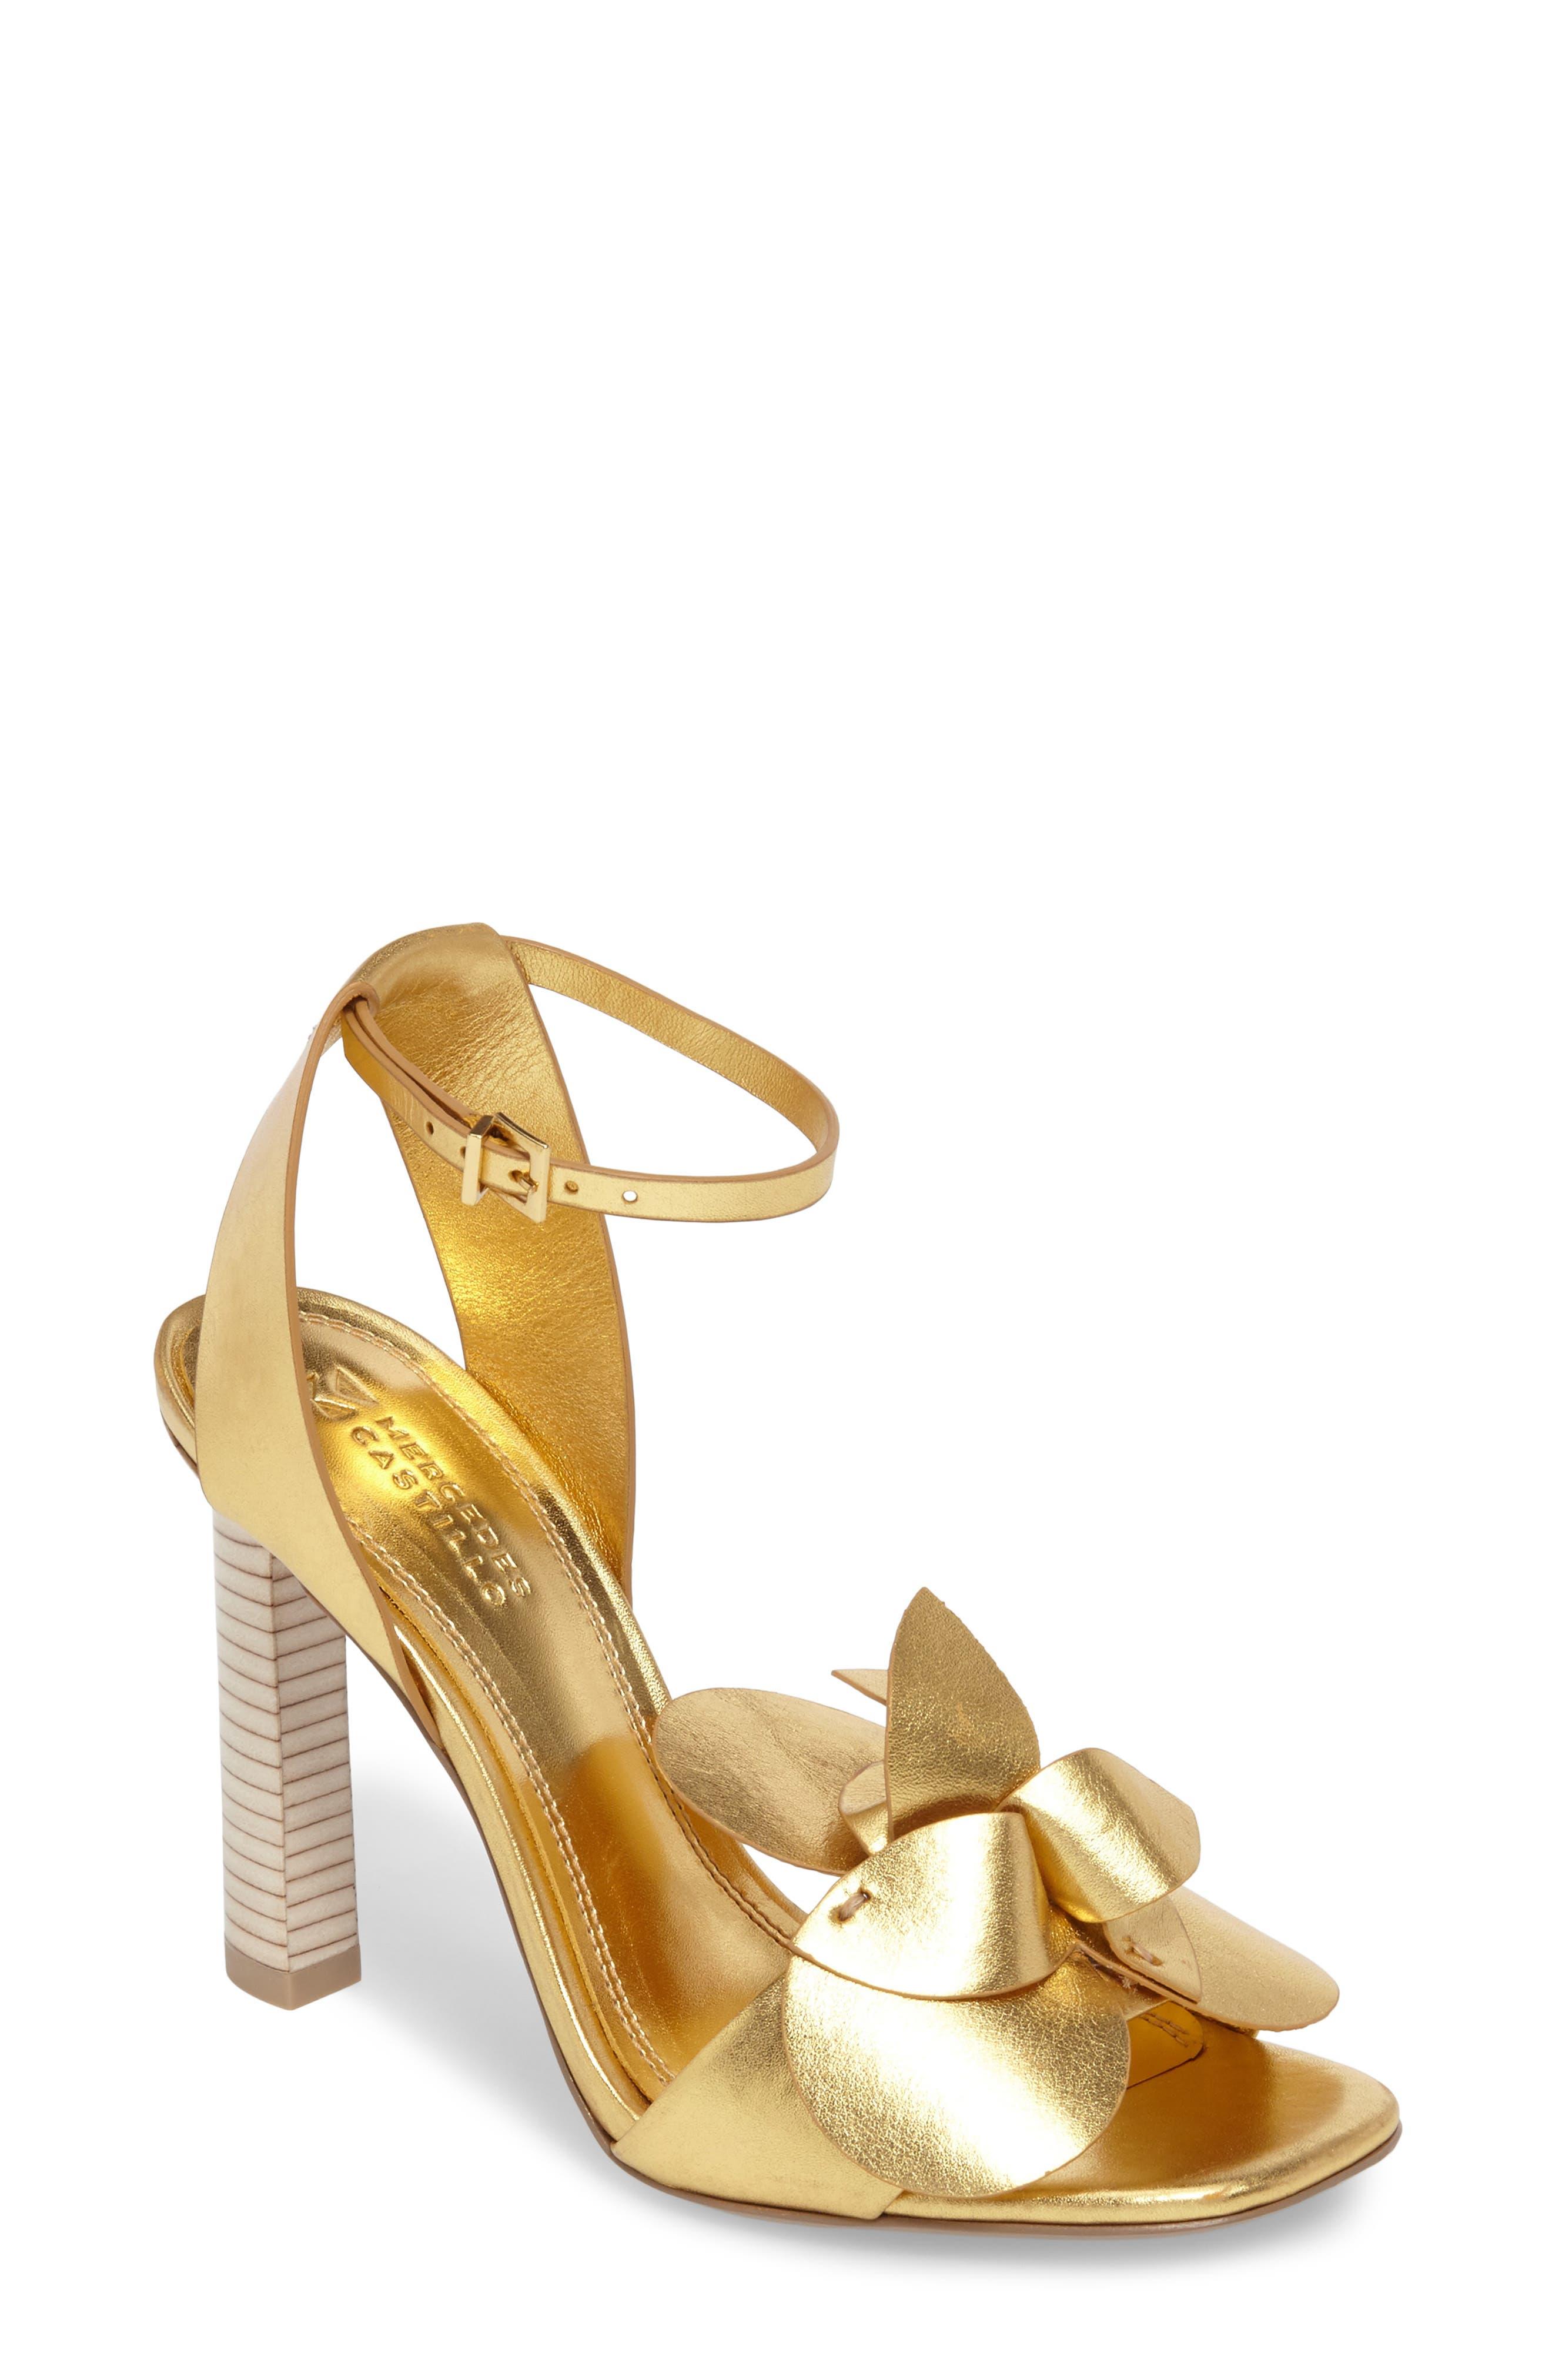 Tealia Sandal,                             Main thumbnail 1, color,                             Gold Leather